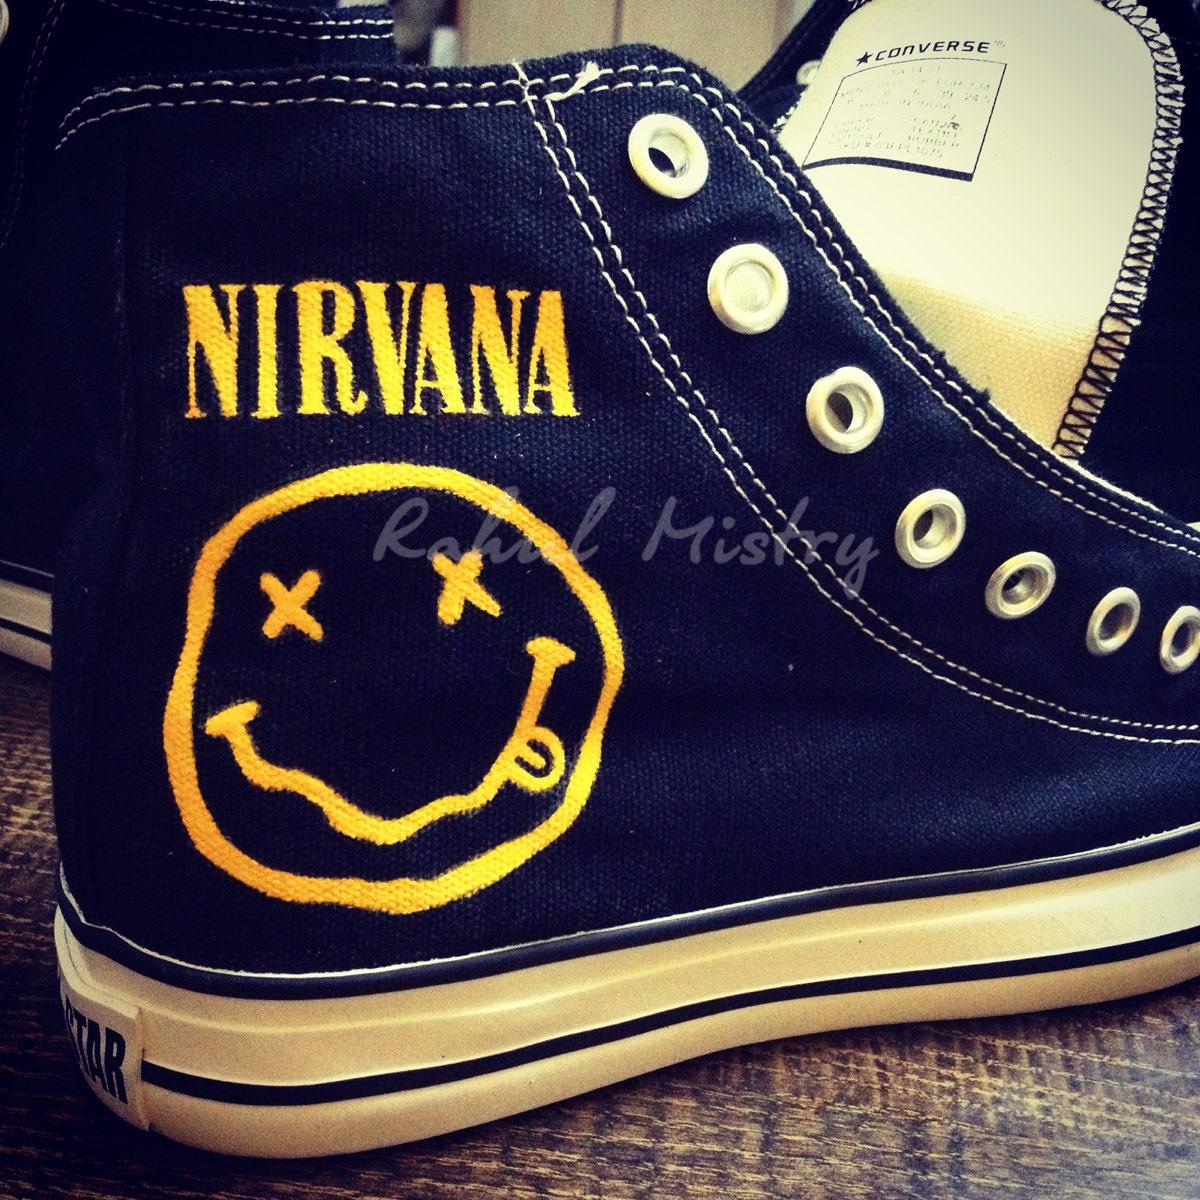 Nirvana Converse Shoes